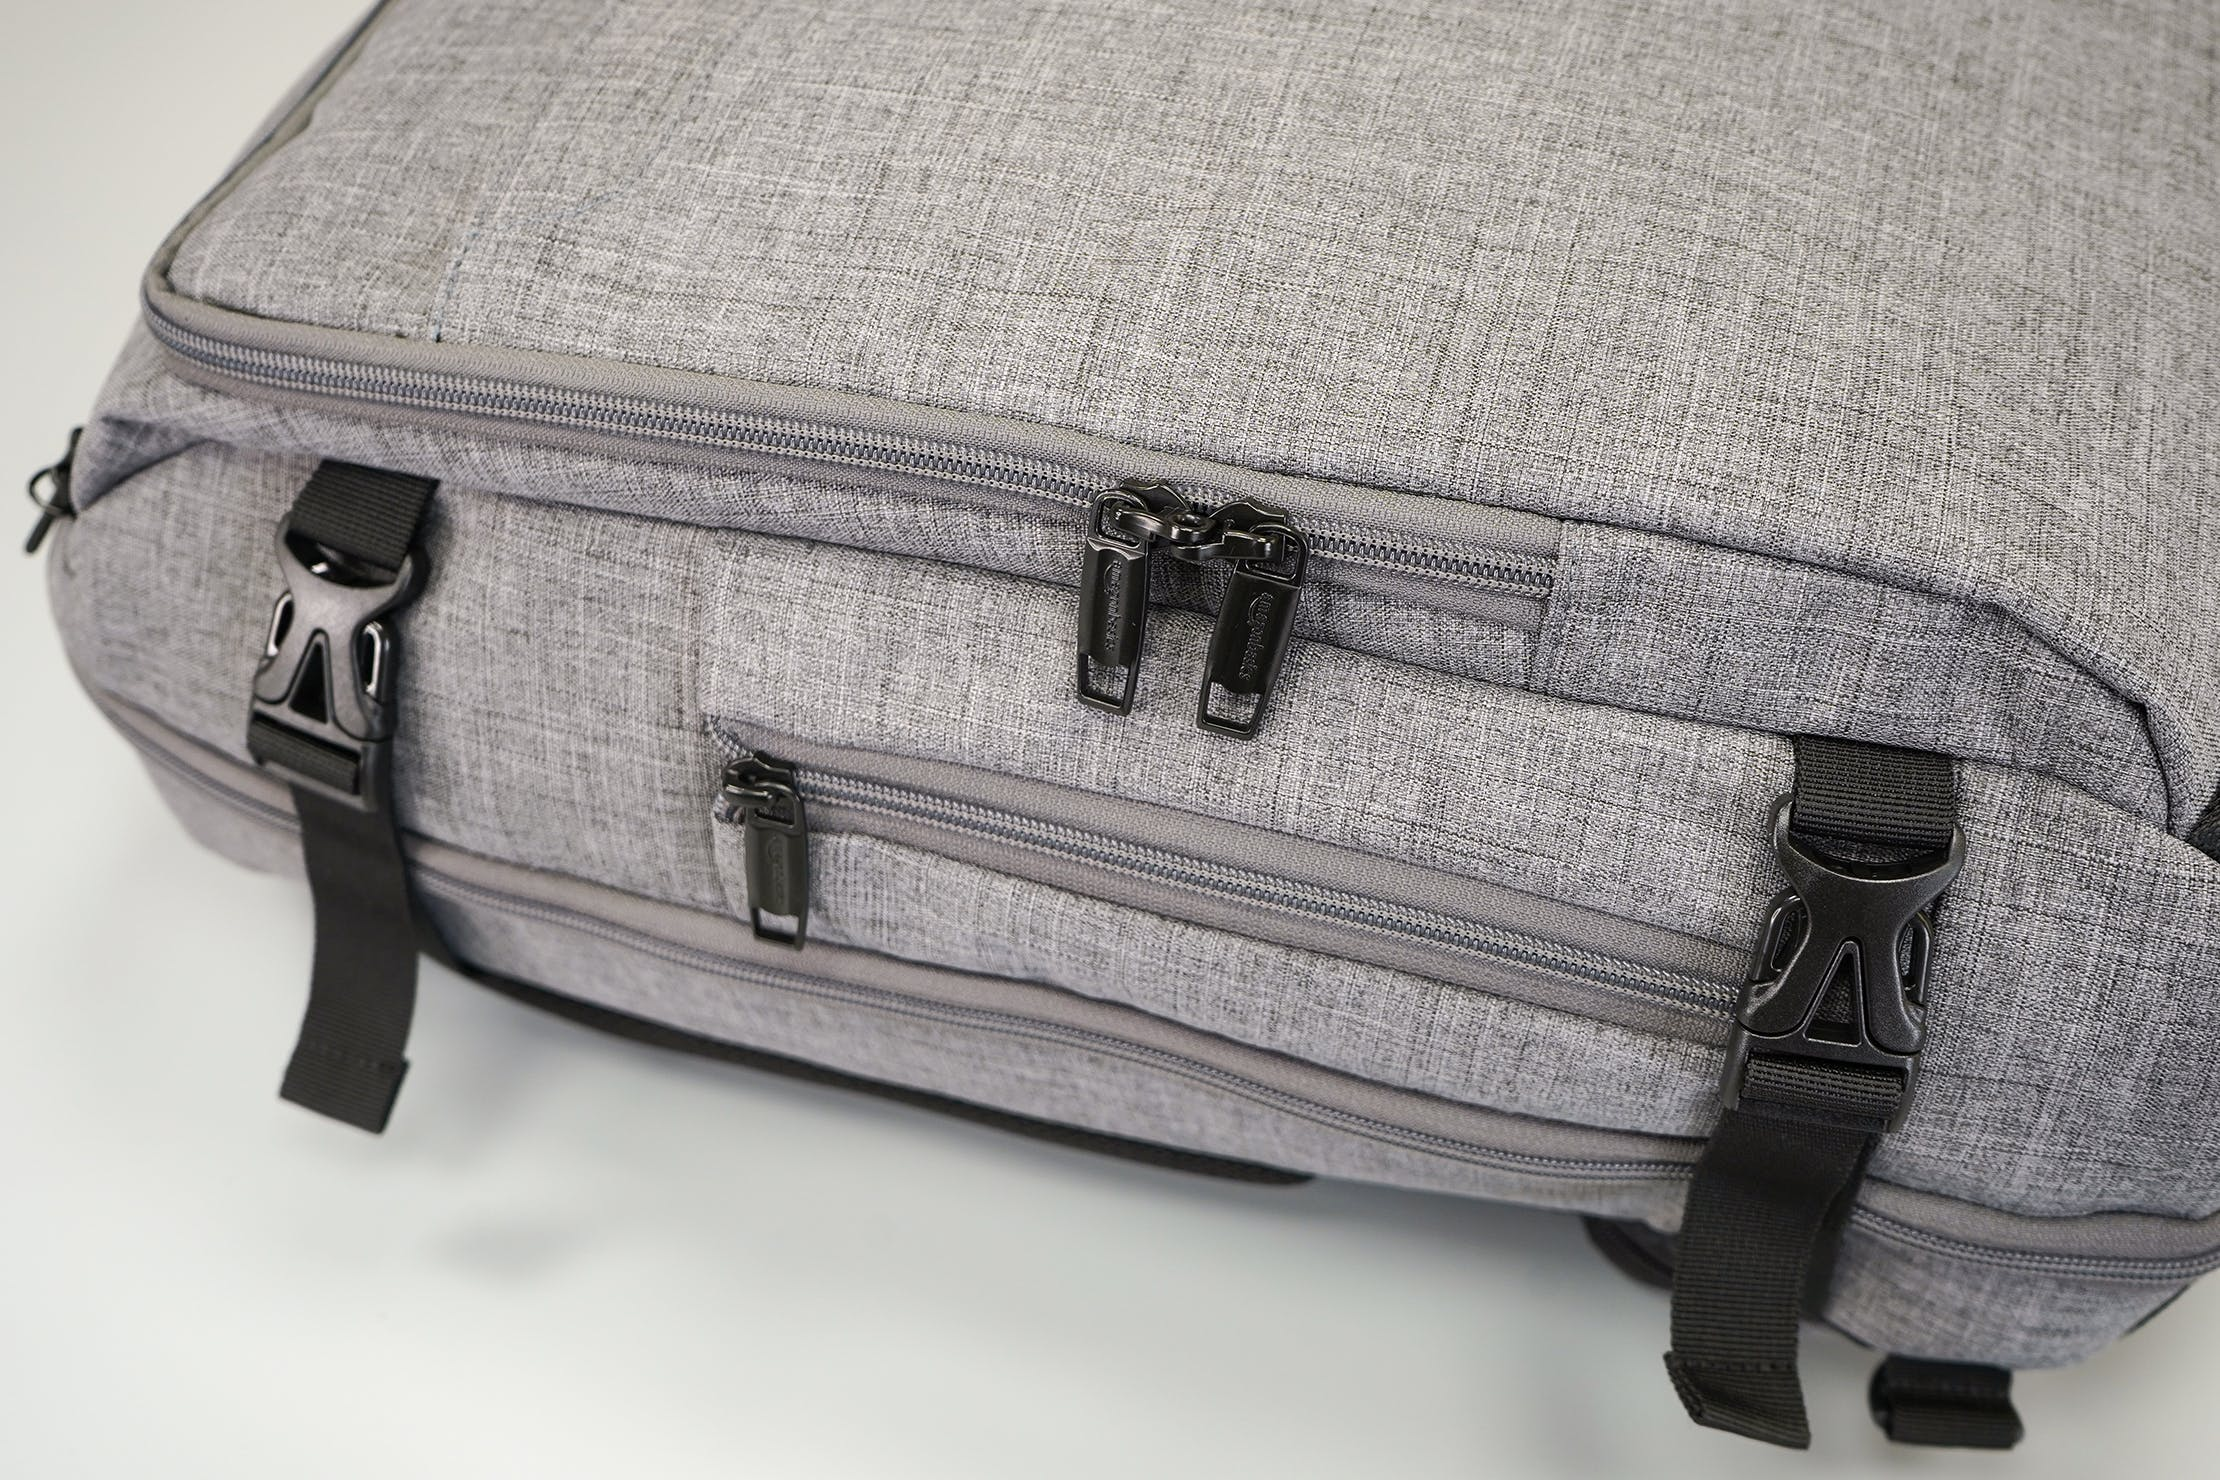 AmazonBasics Slim Travel Backpack Weekender YKK Zips & Duraflex Buckles